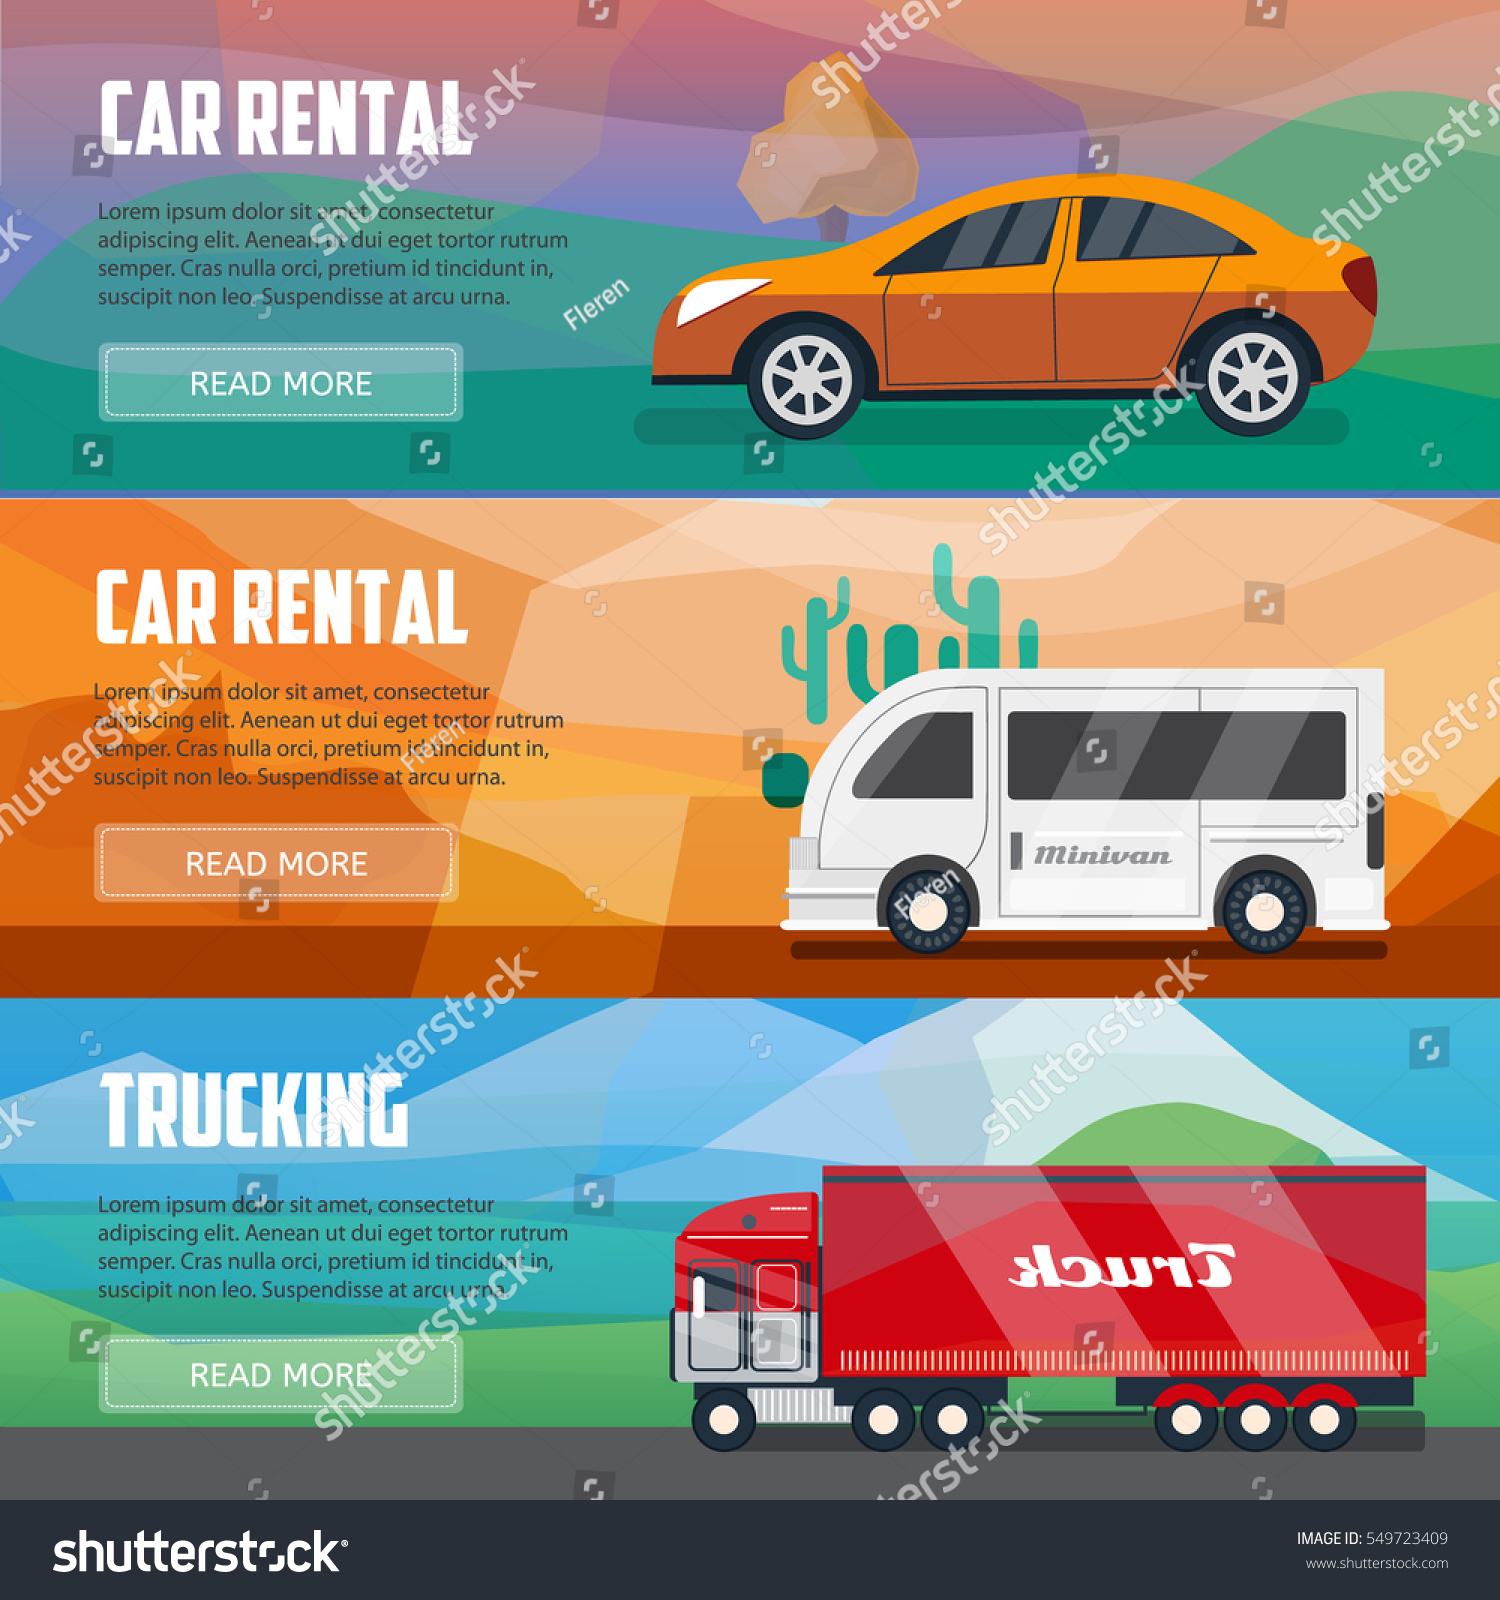 Rental Agencys: Trucking Car Rental Banners Horizontal Banners Stock